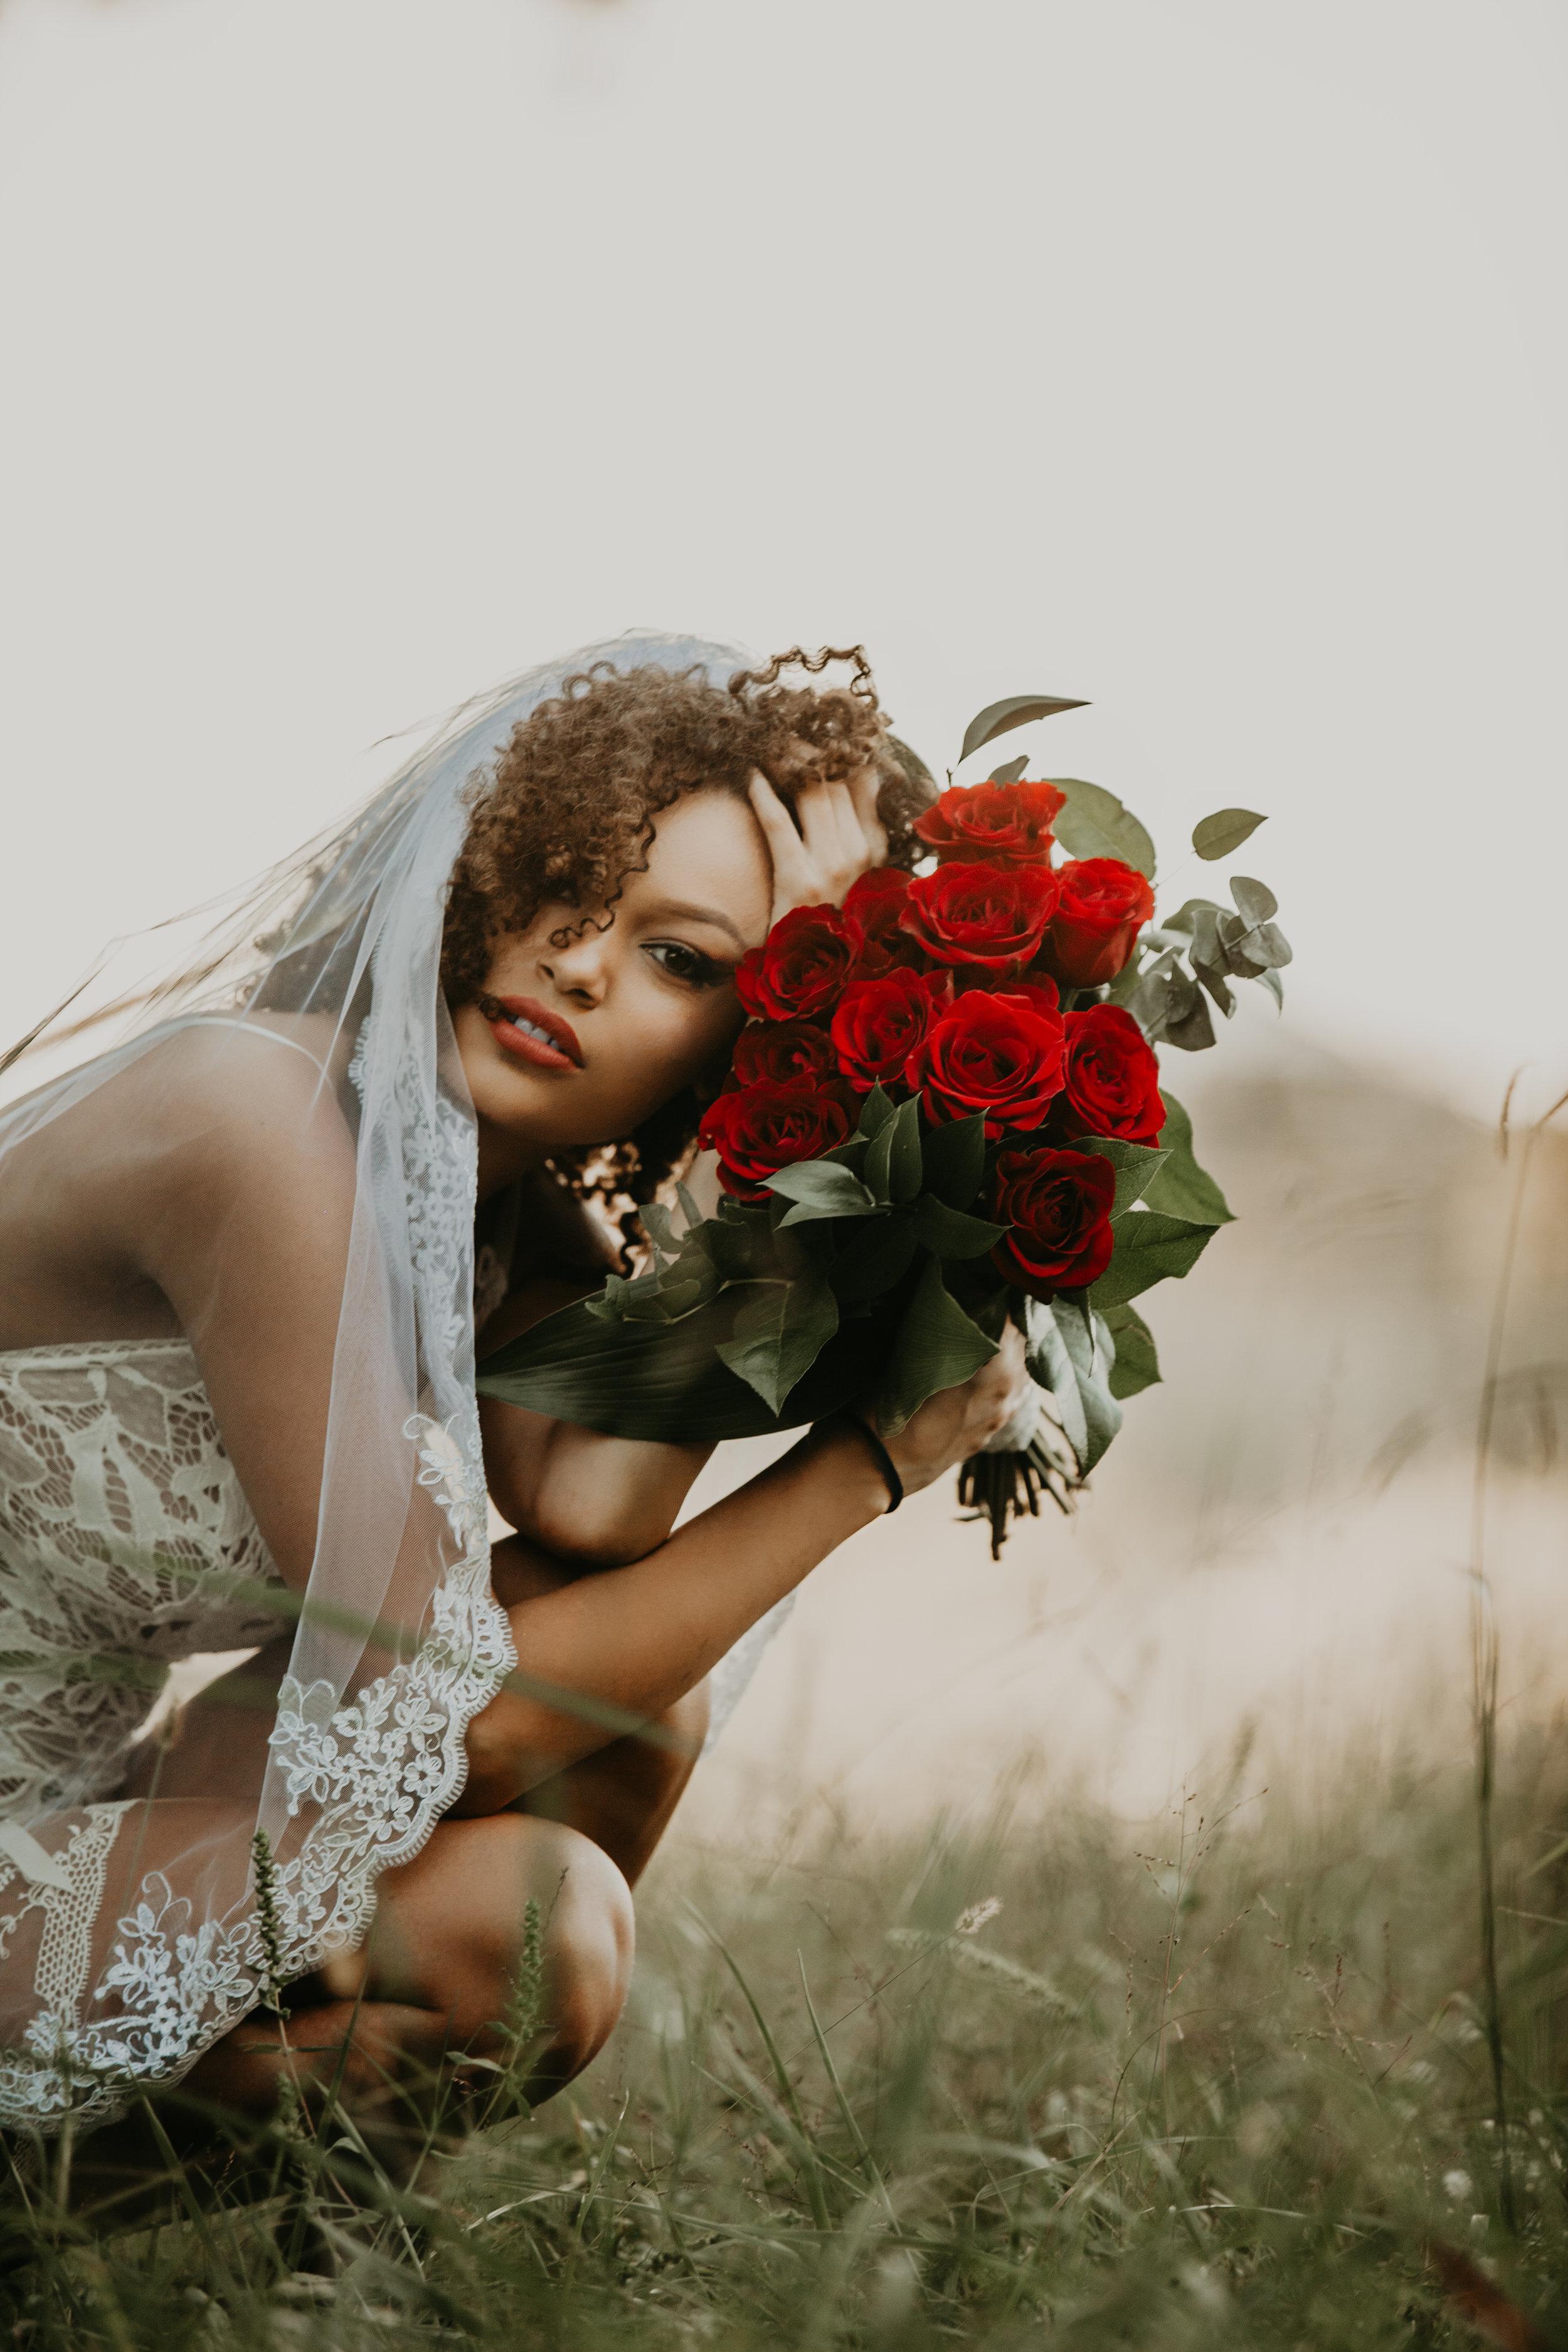 boudoir-dessert-conway-central-arkansas-bridal-photographer-little-rock-photography-outdoor-wedding-boho-fashion-engagement-elopement-bouquet-bride-soiree-magazine-photoshoot-arkansasbride-pinnacle-mountain-car-vintage